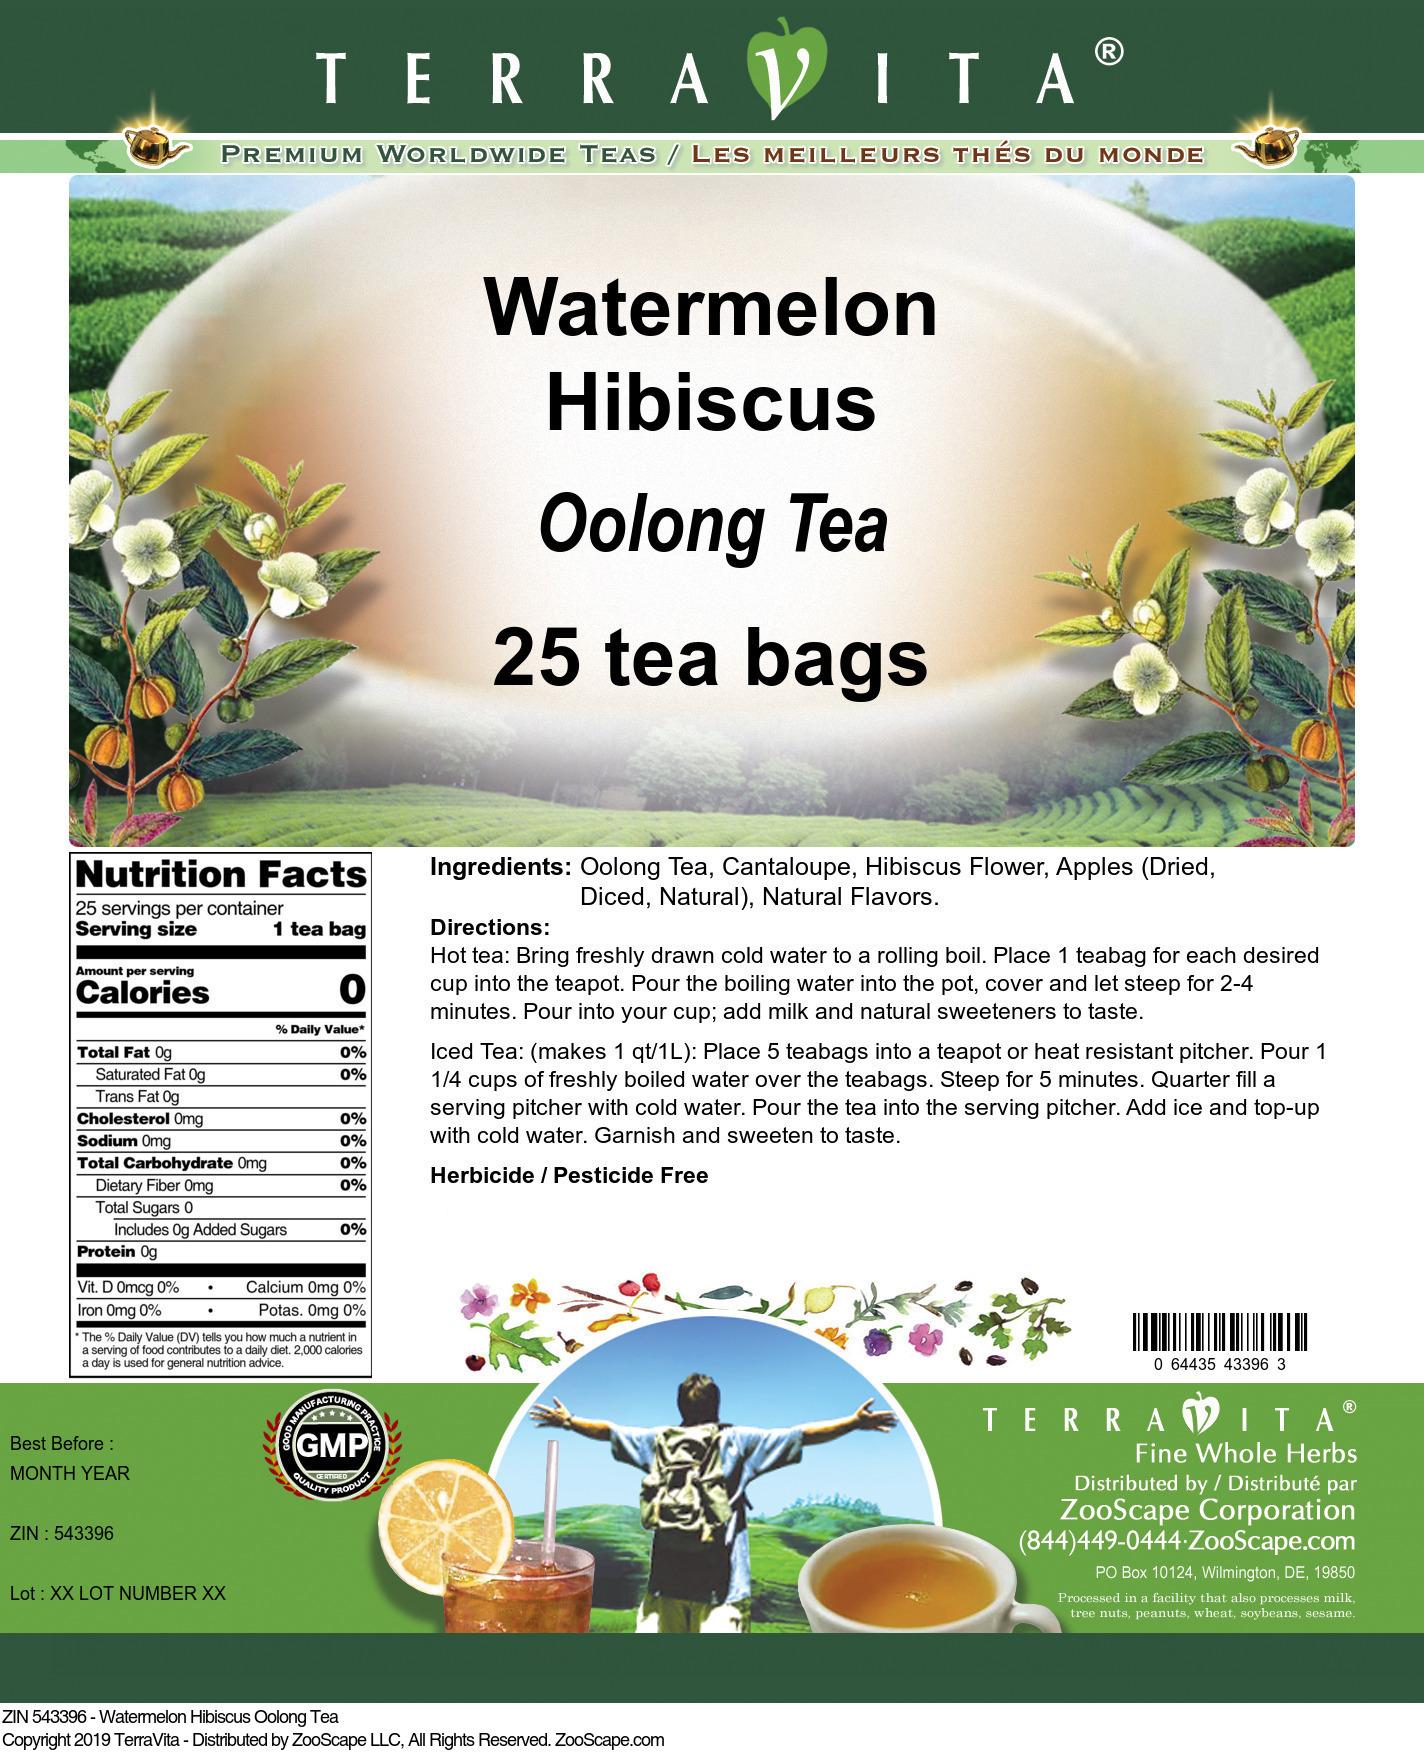 Watermelon Hibiscus Oolong Tea